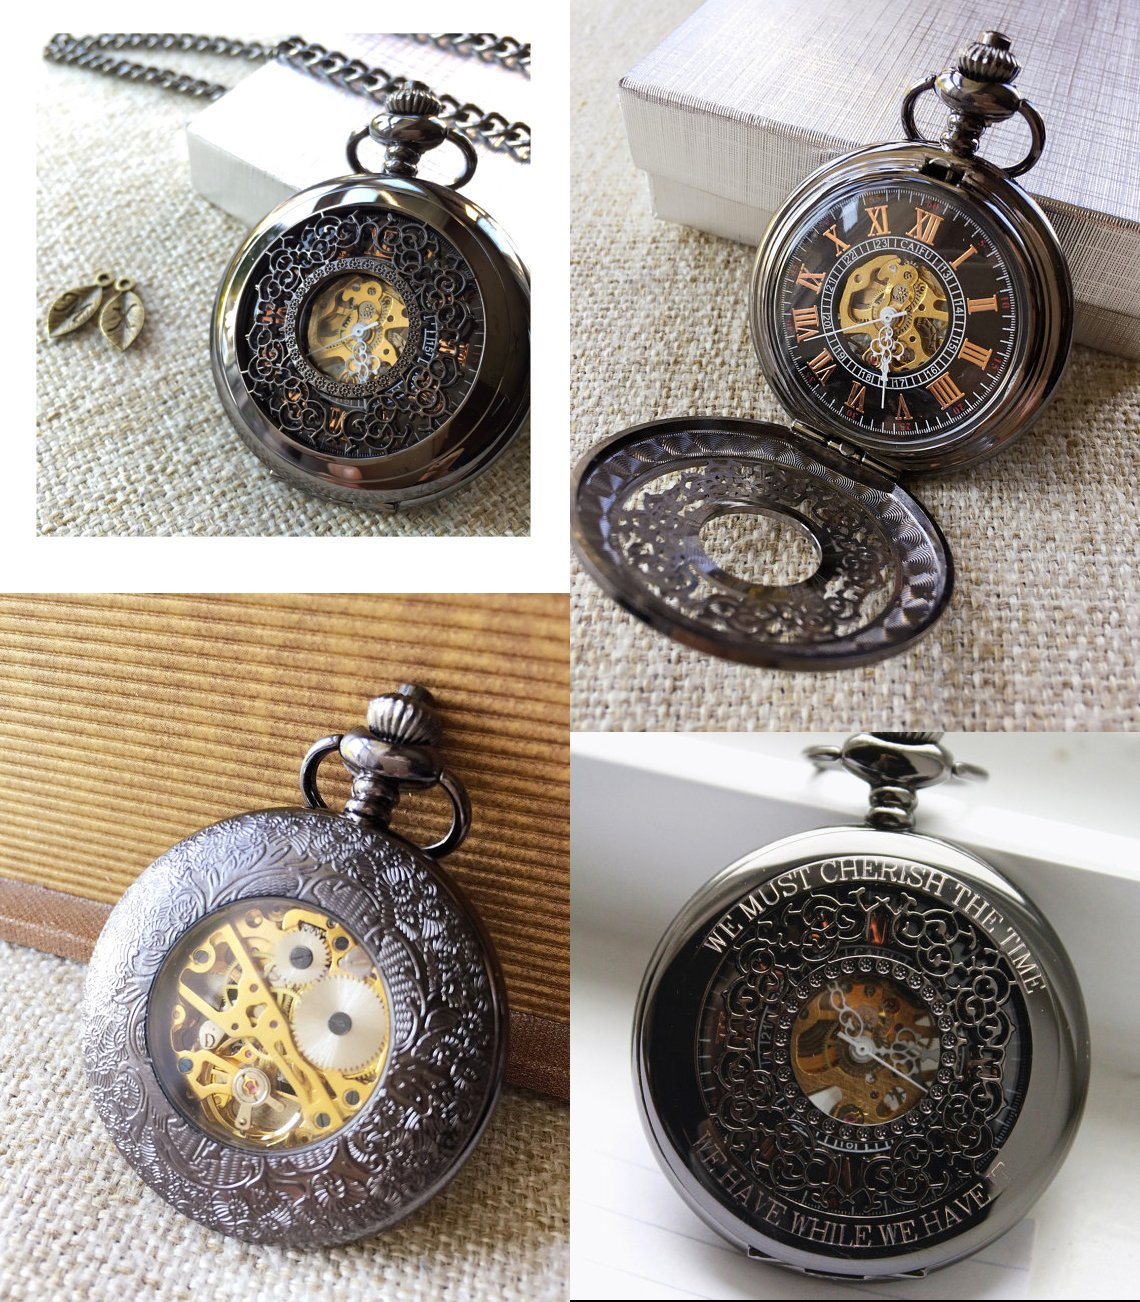 Personalized steampunk watch